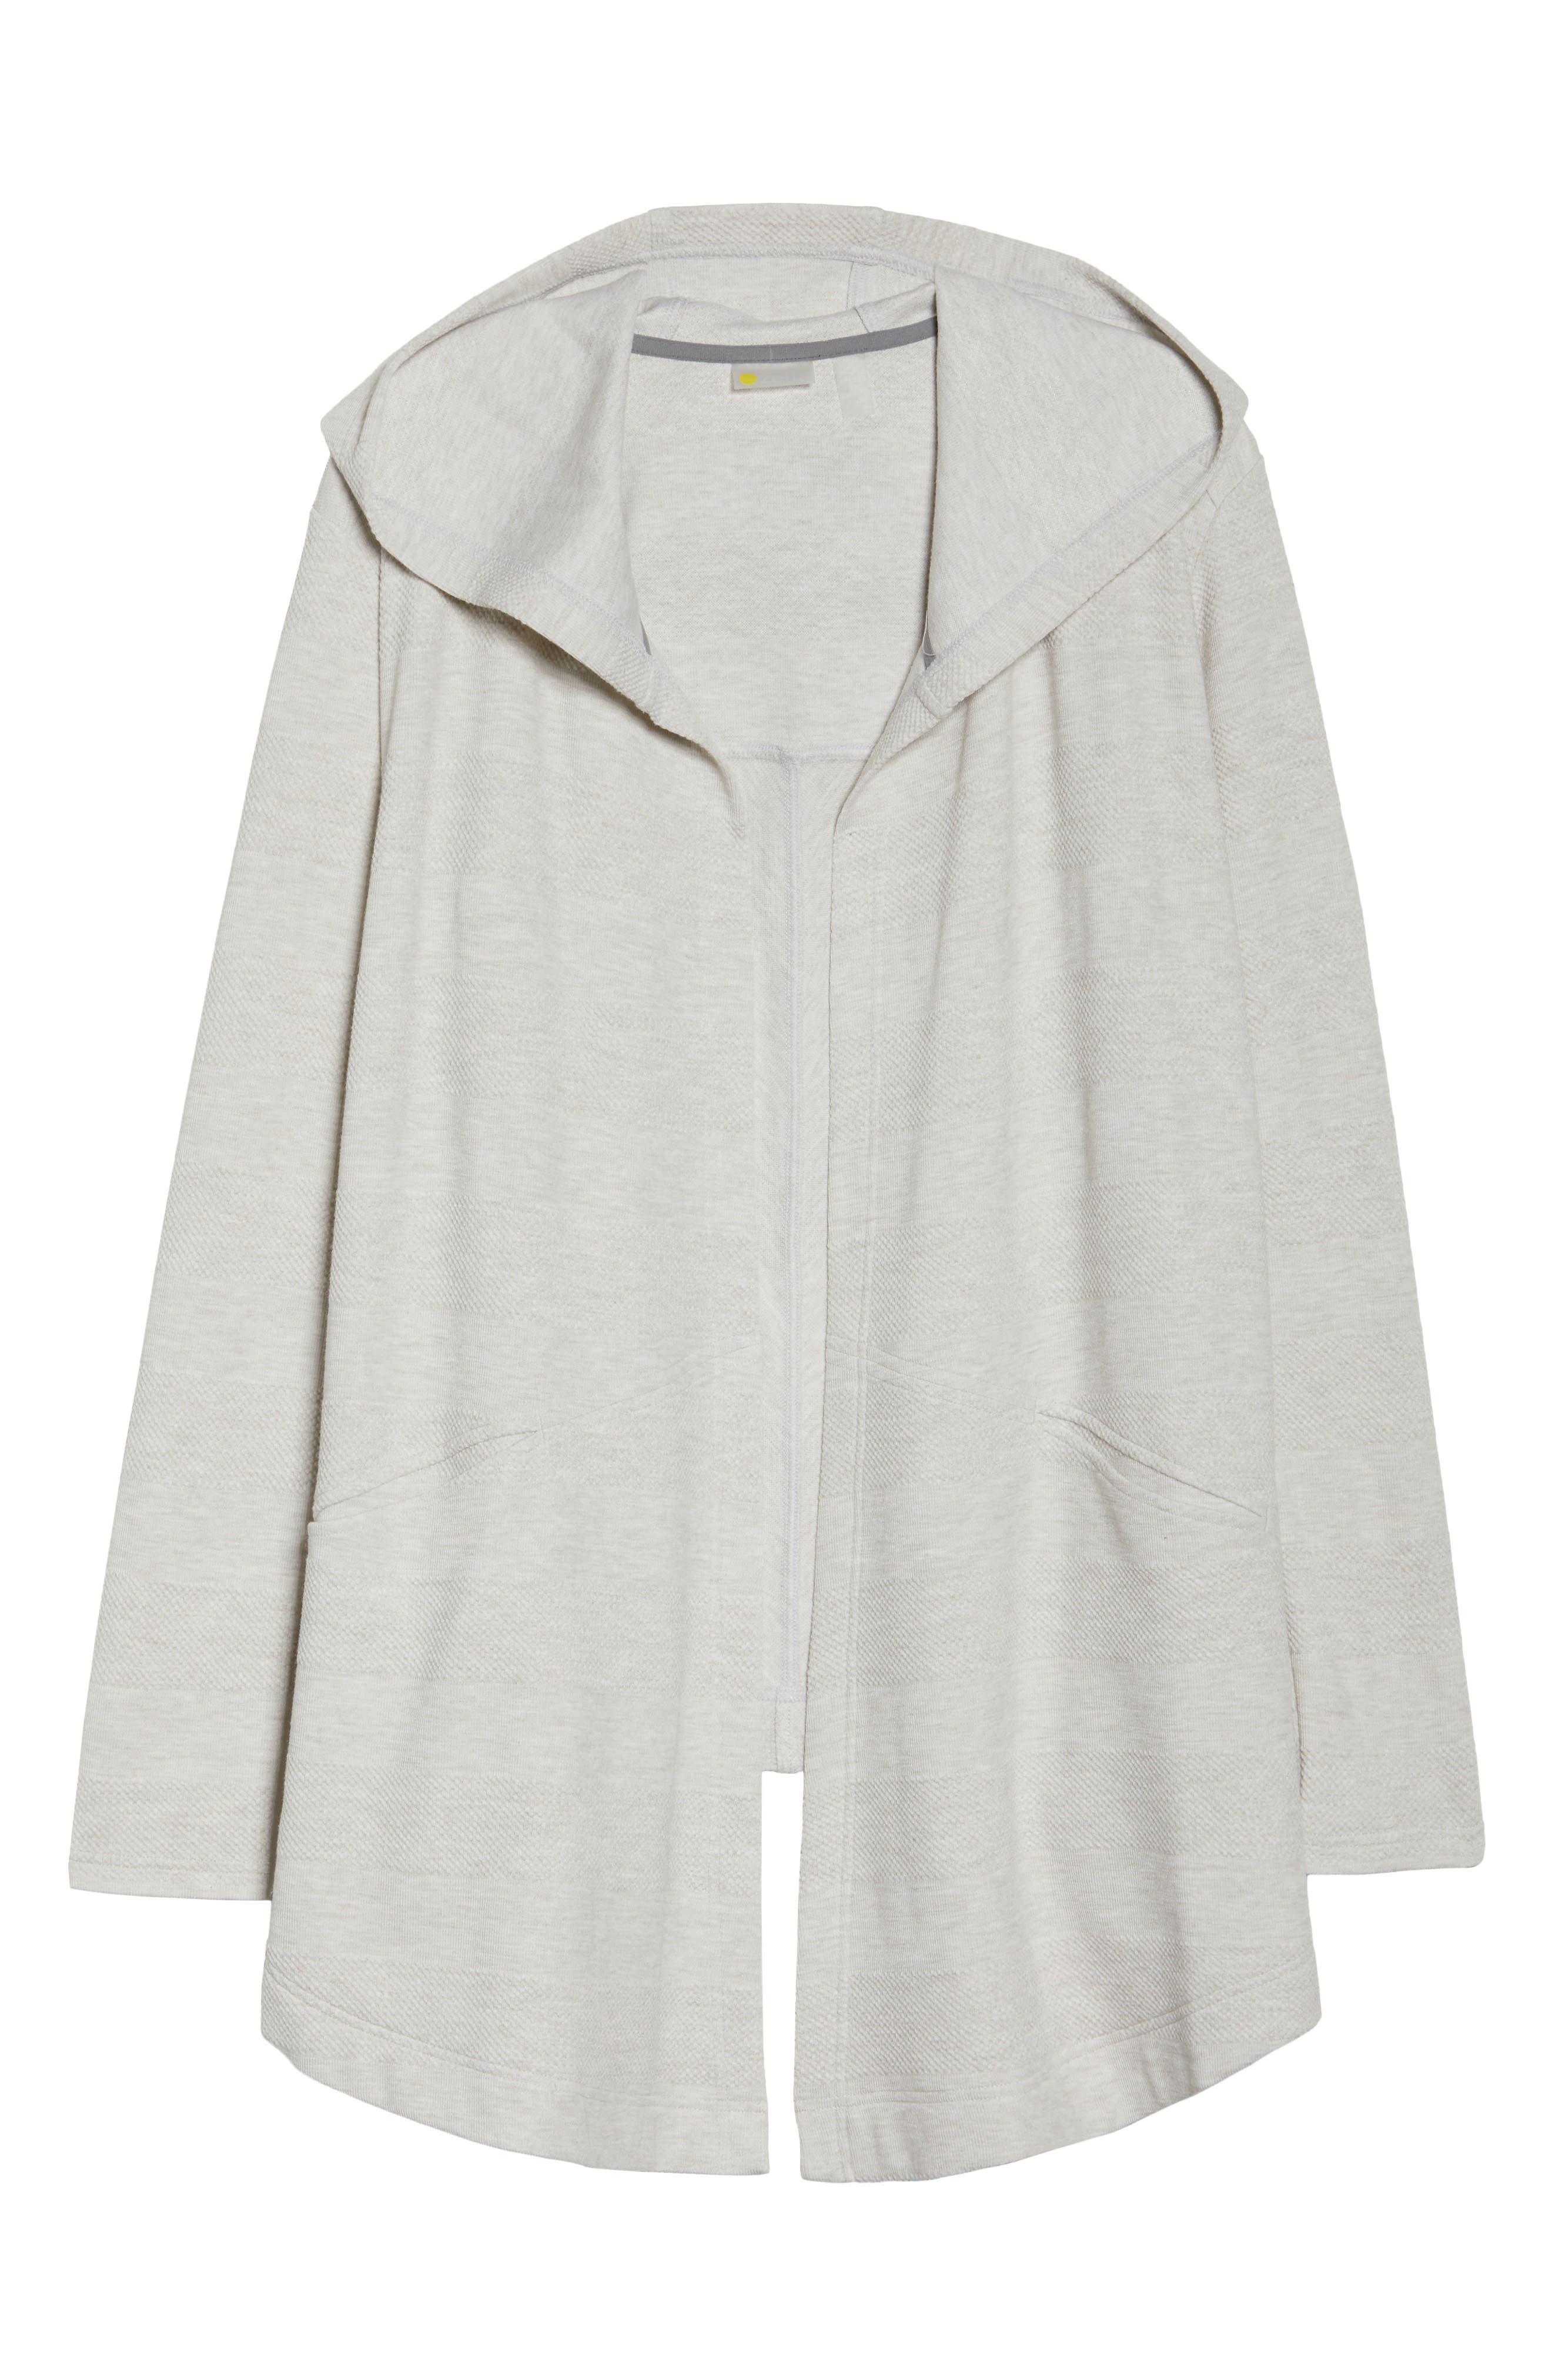 Ria Hooded Cardigan,                         Main,                         color, Grey Crystal Heather